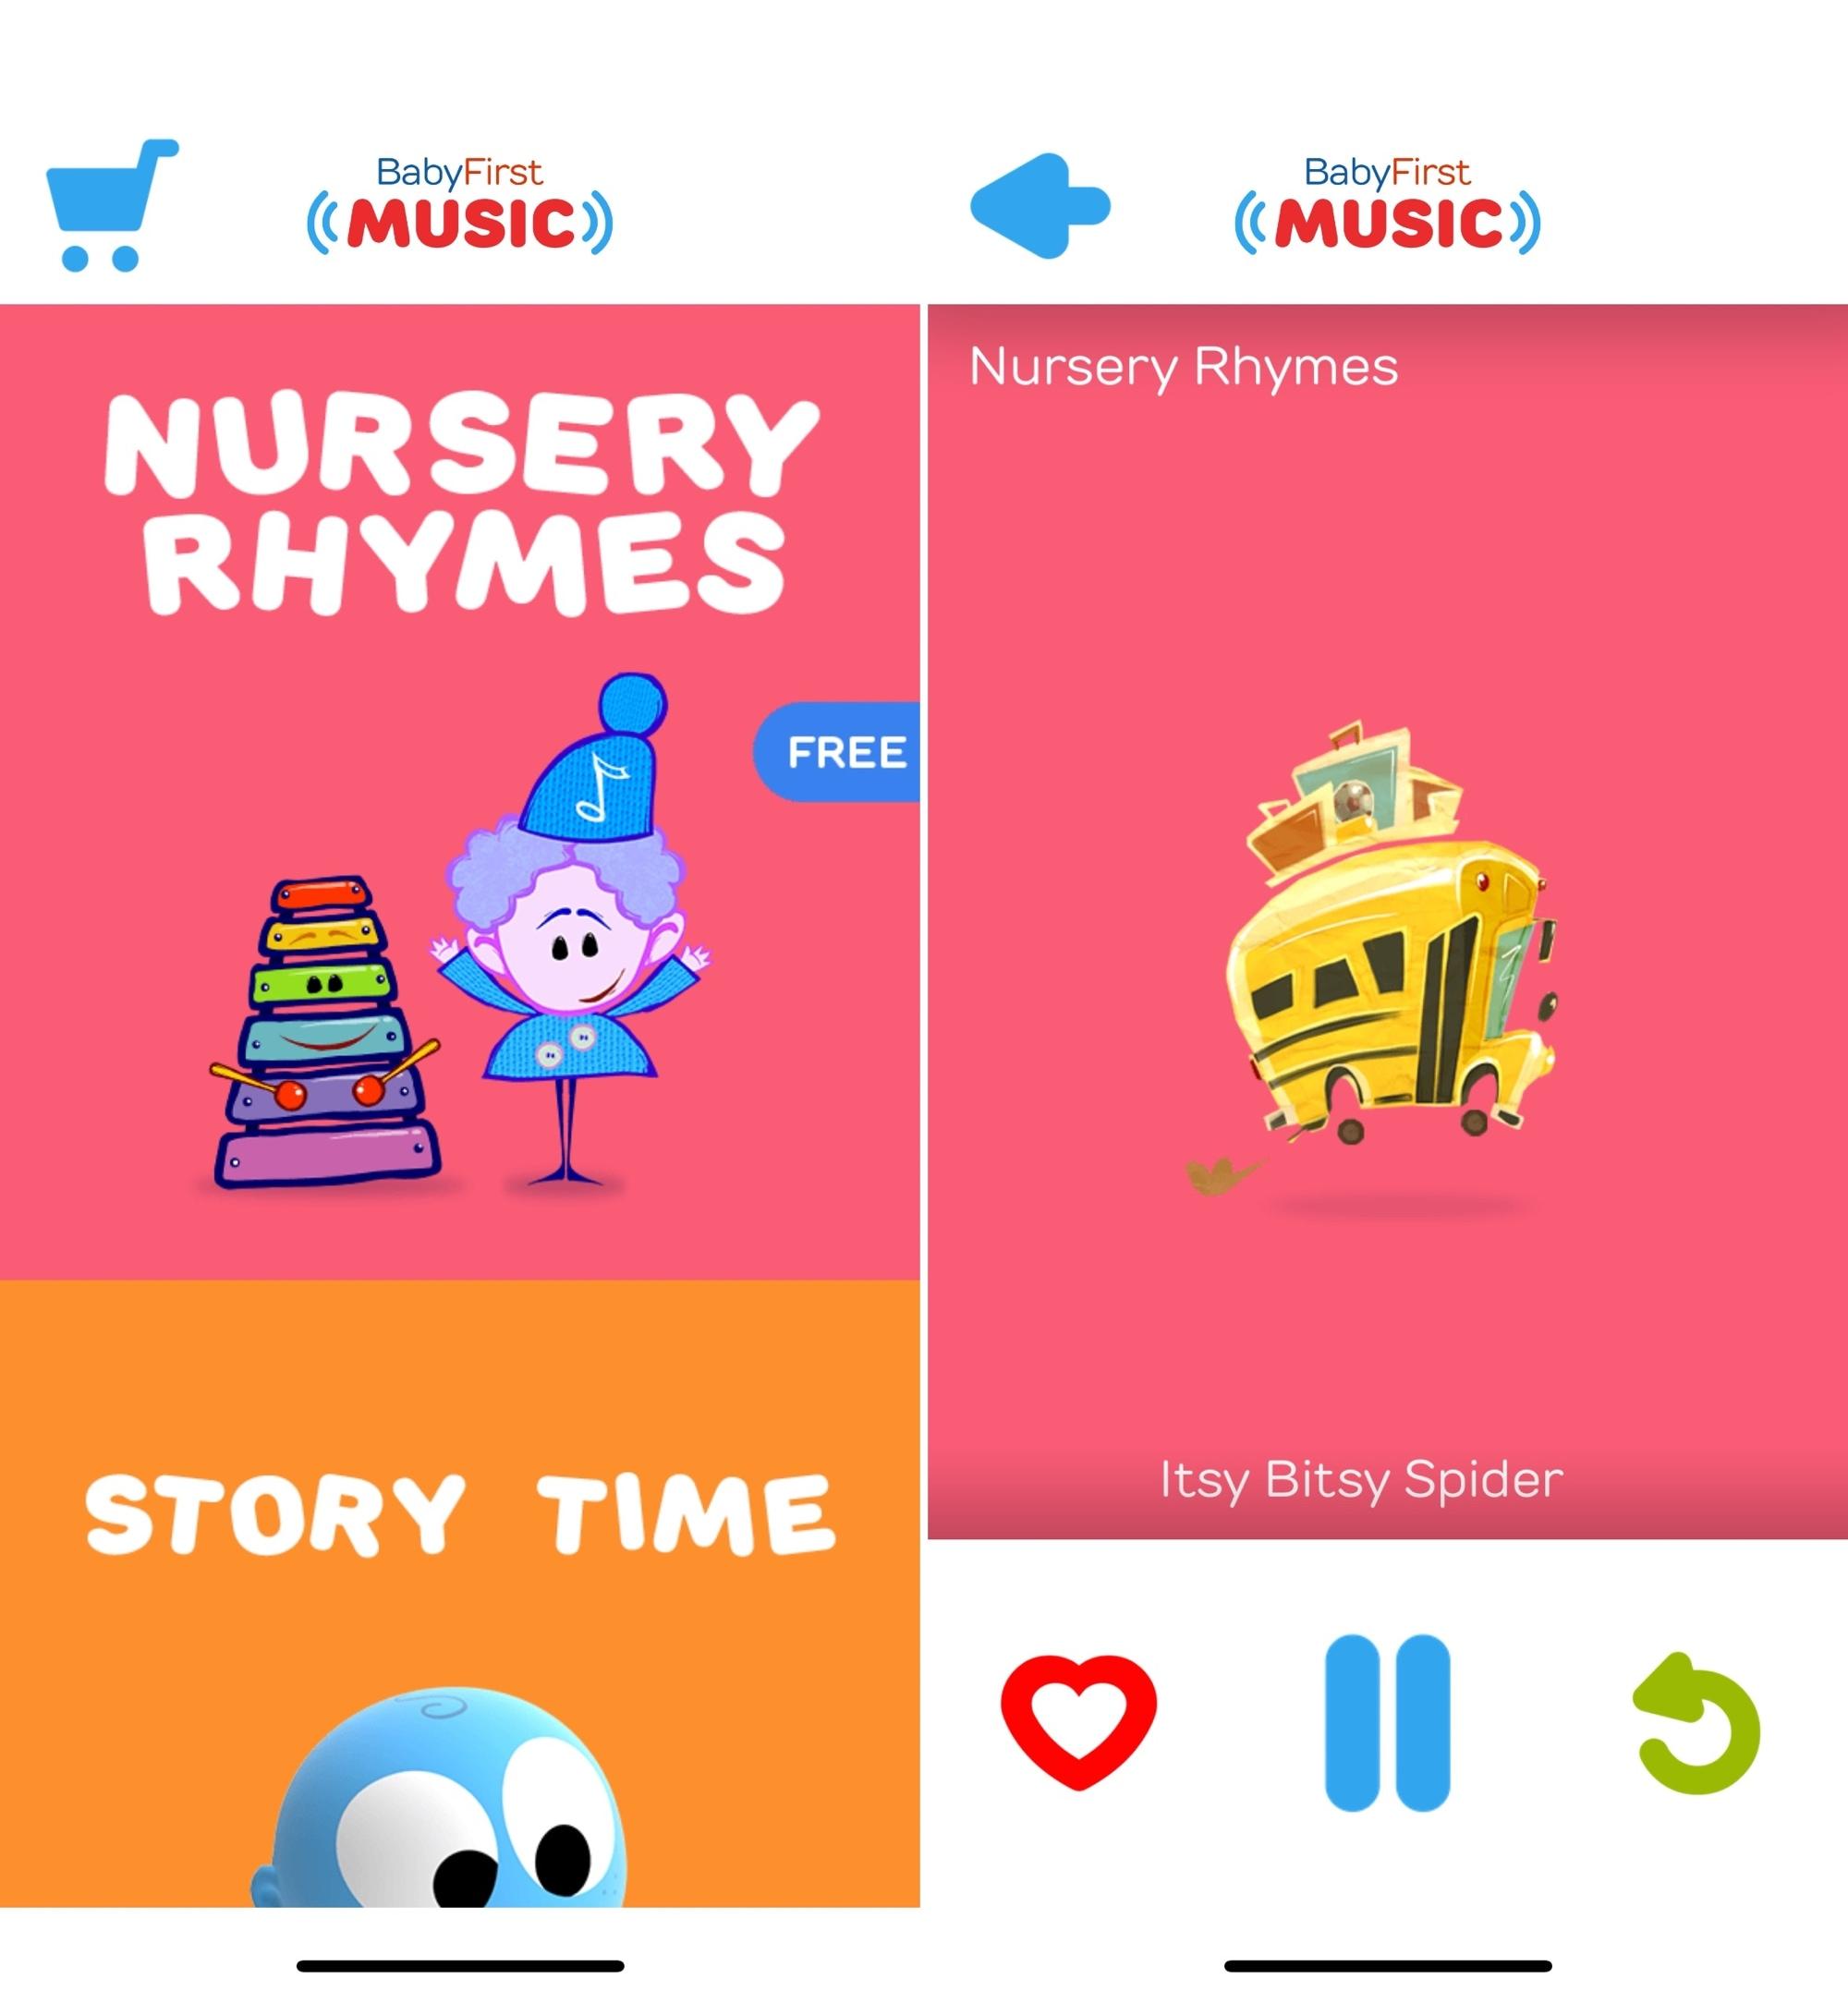 BabyFirst Baby Music on iPhone